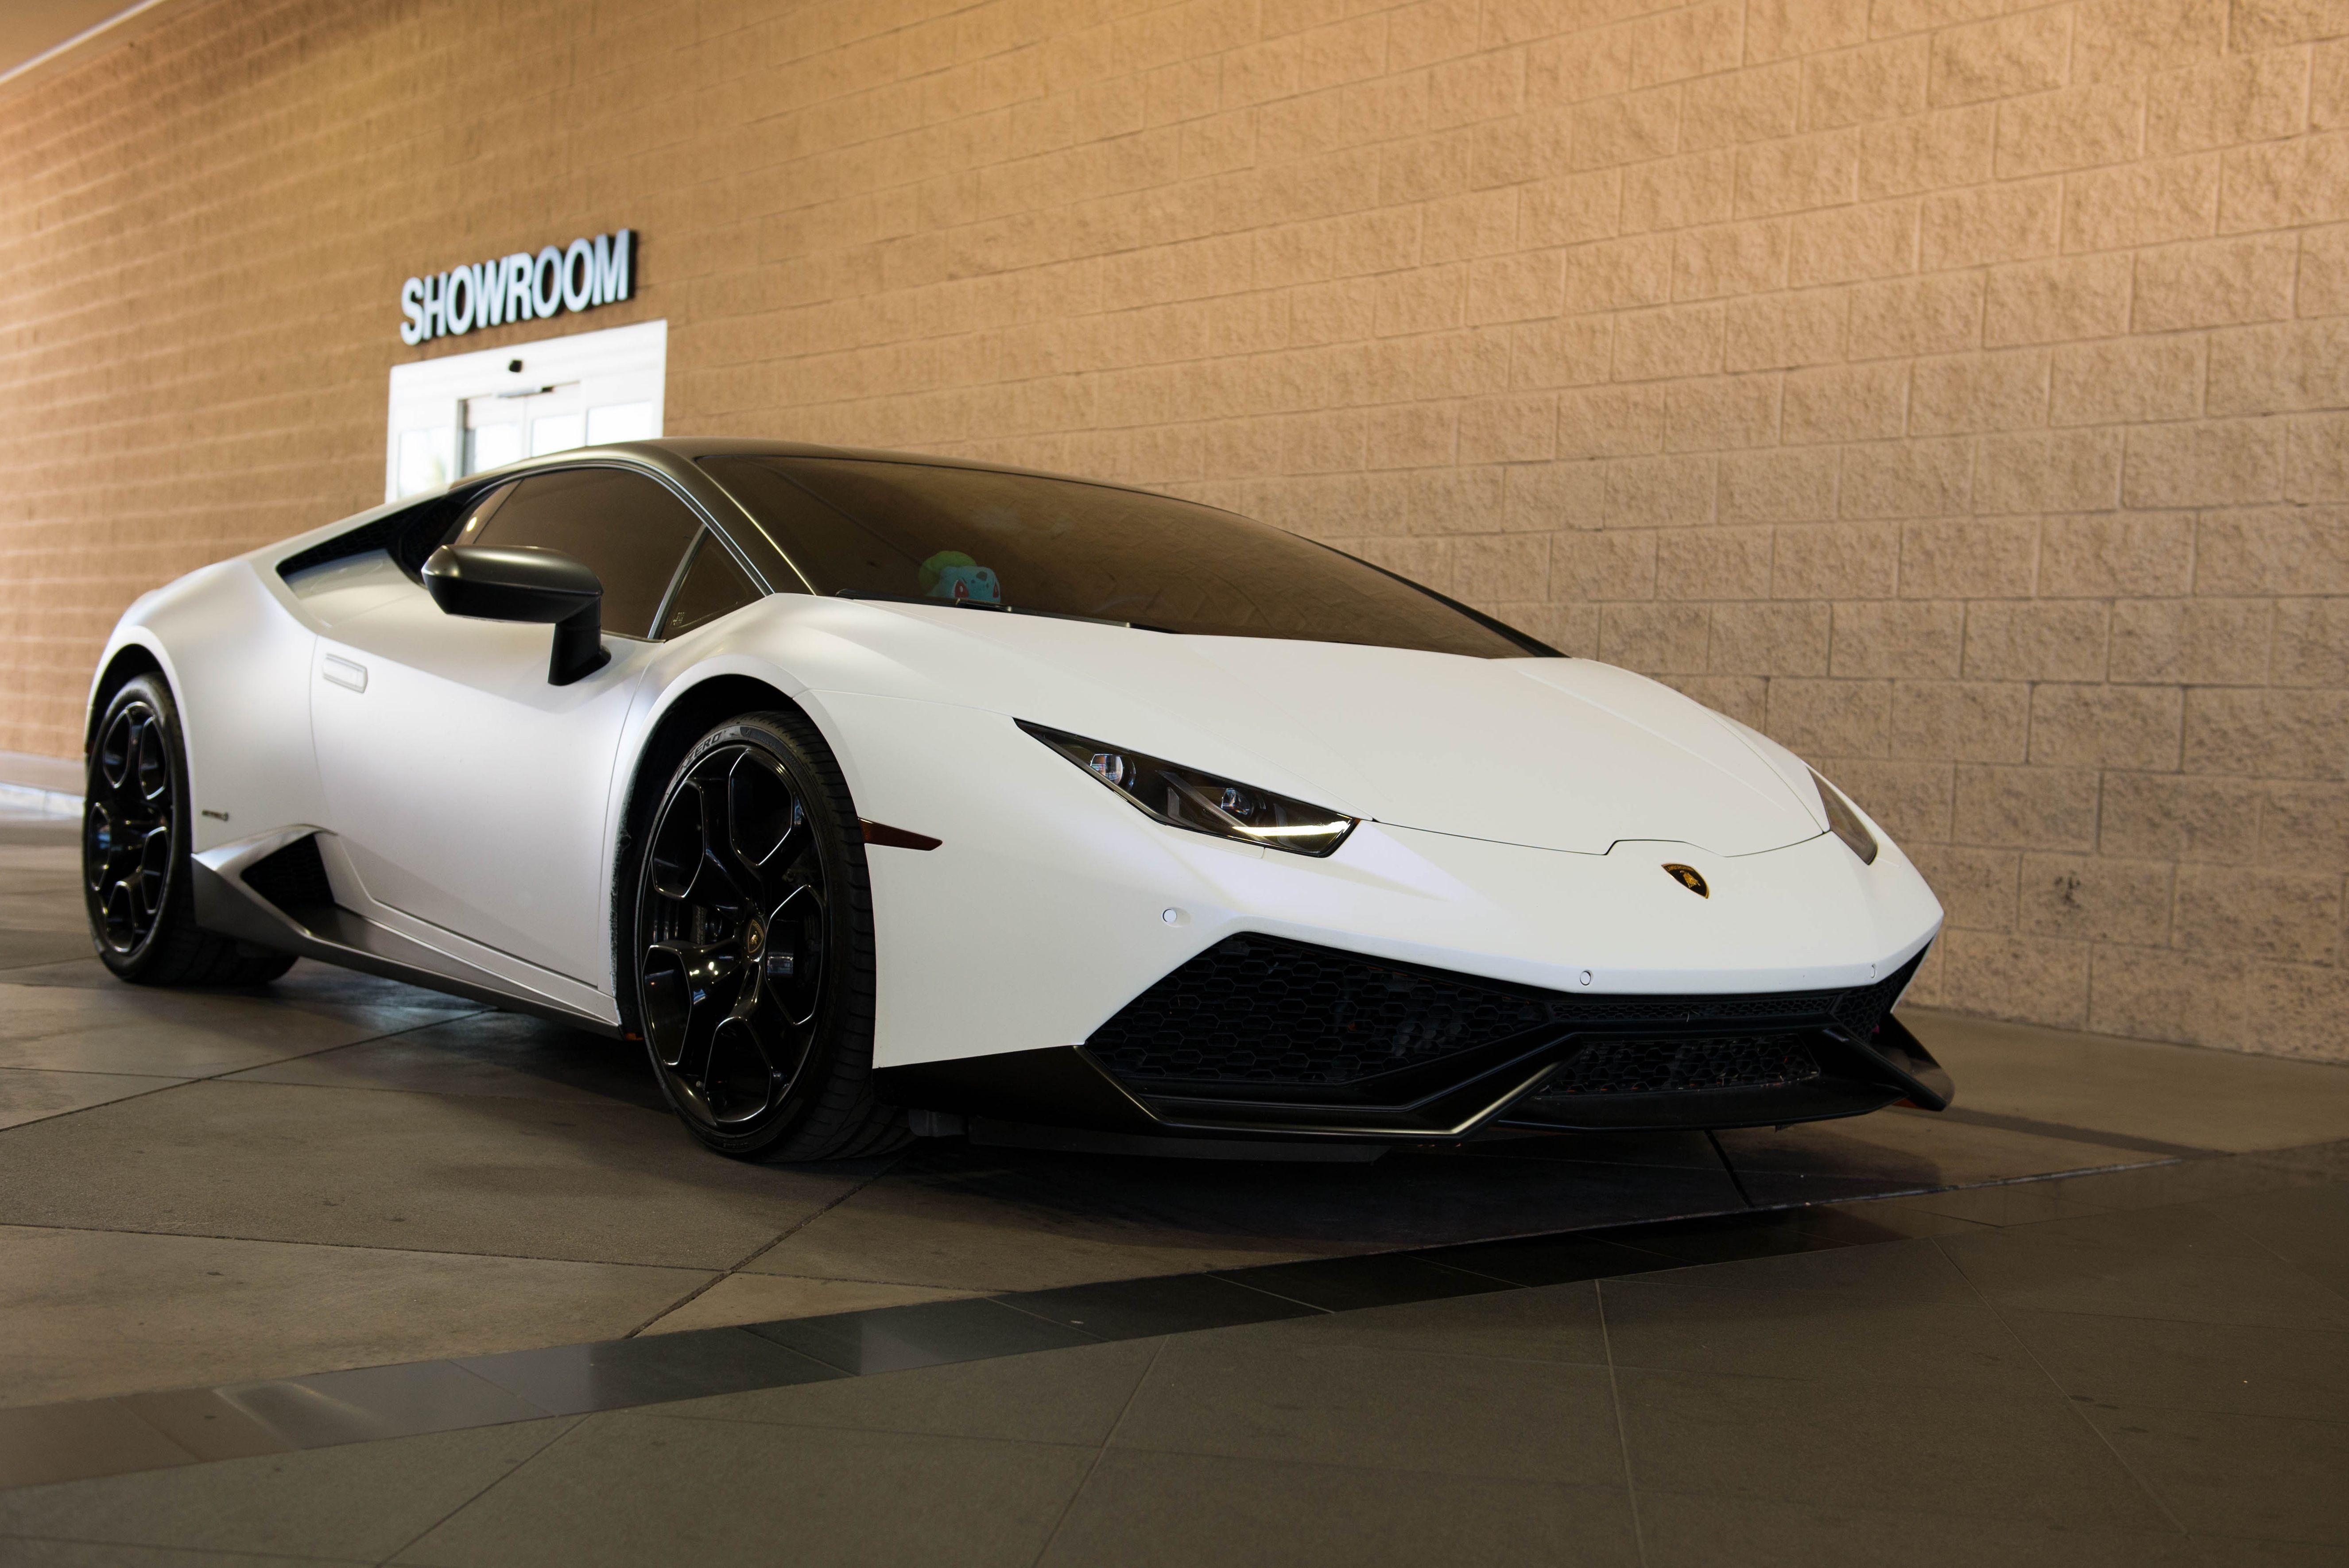 8026c7472a2883e13007b345b4c7f266 Marvelous Lamborghini Huracan Price In Uae Cars Trend